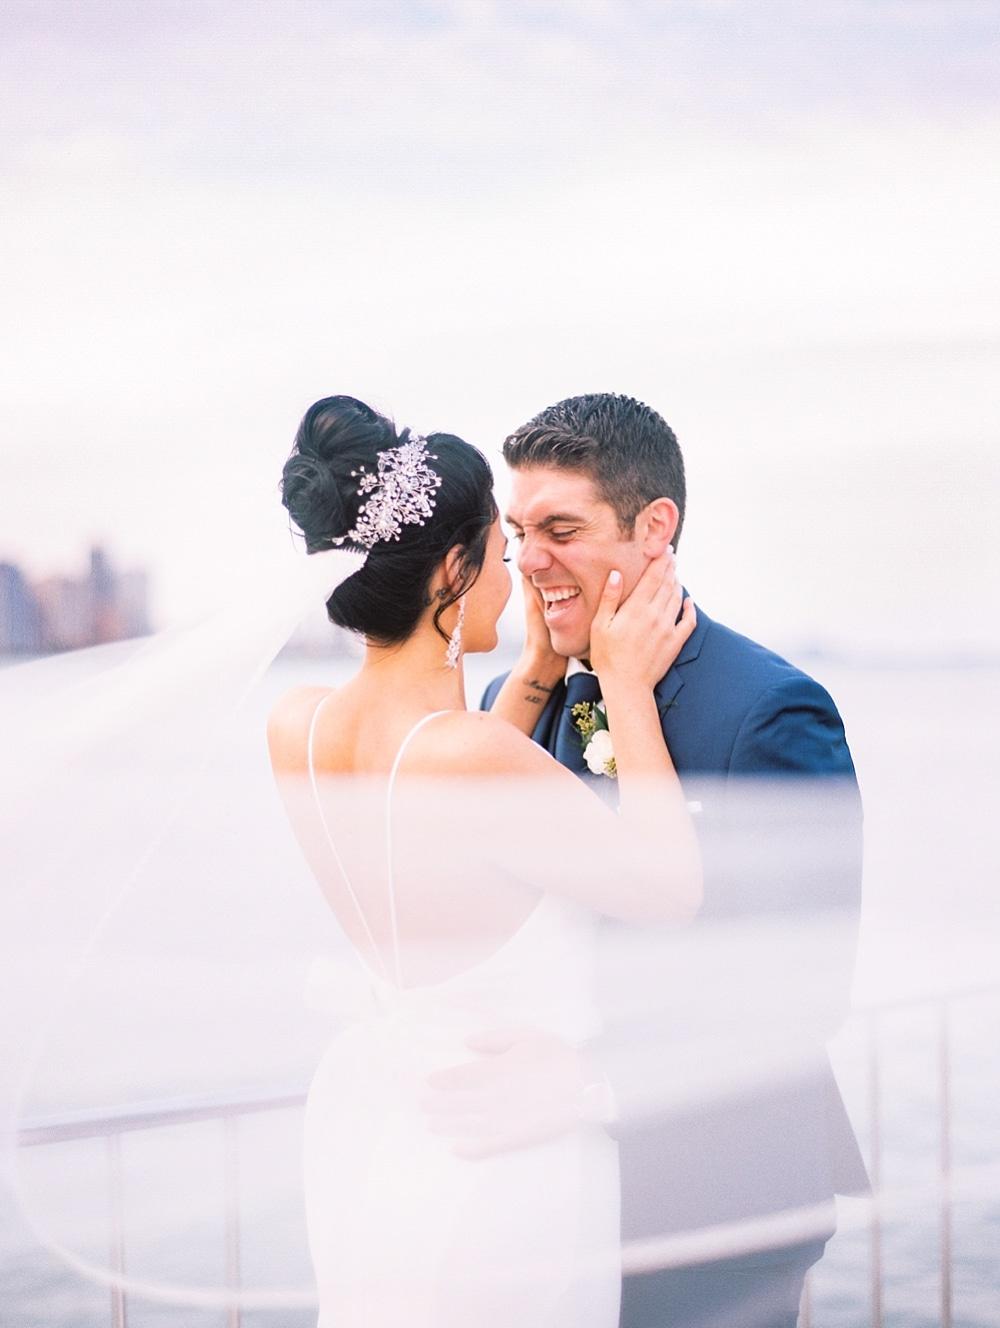 Kristin-La-Voie-Photography-chicago-wedding-photographer-18